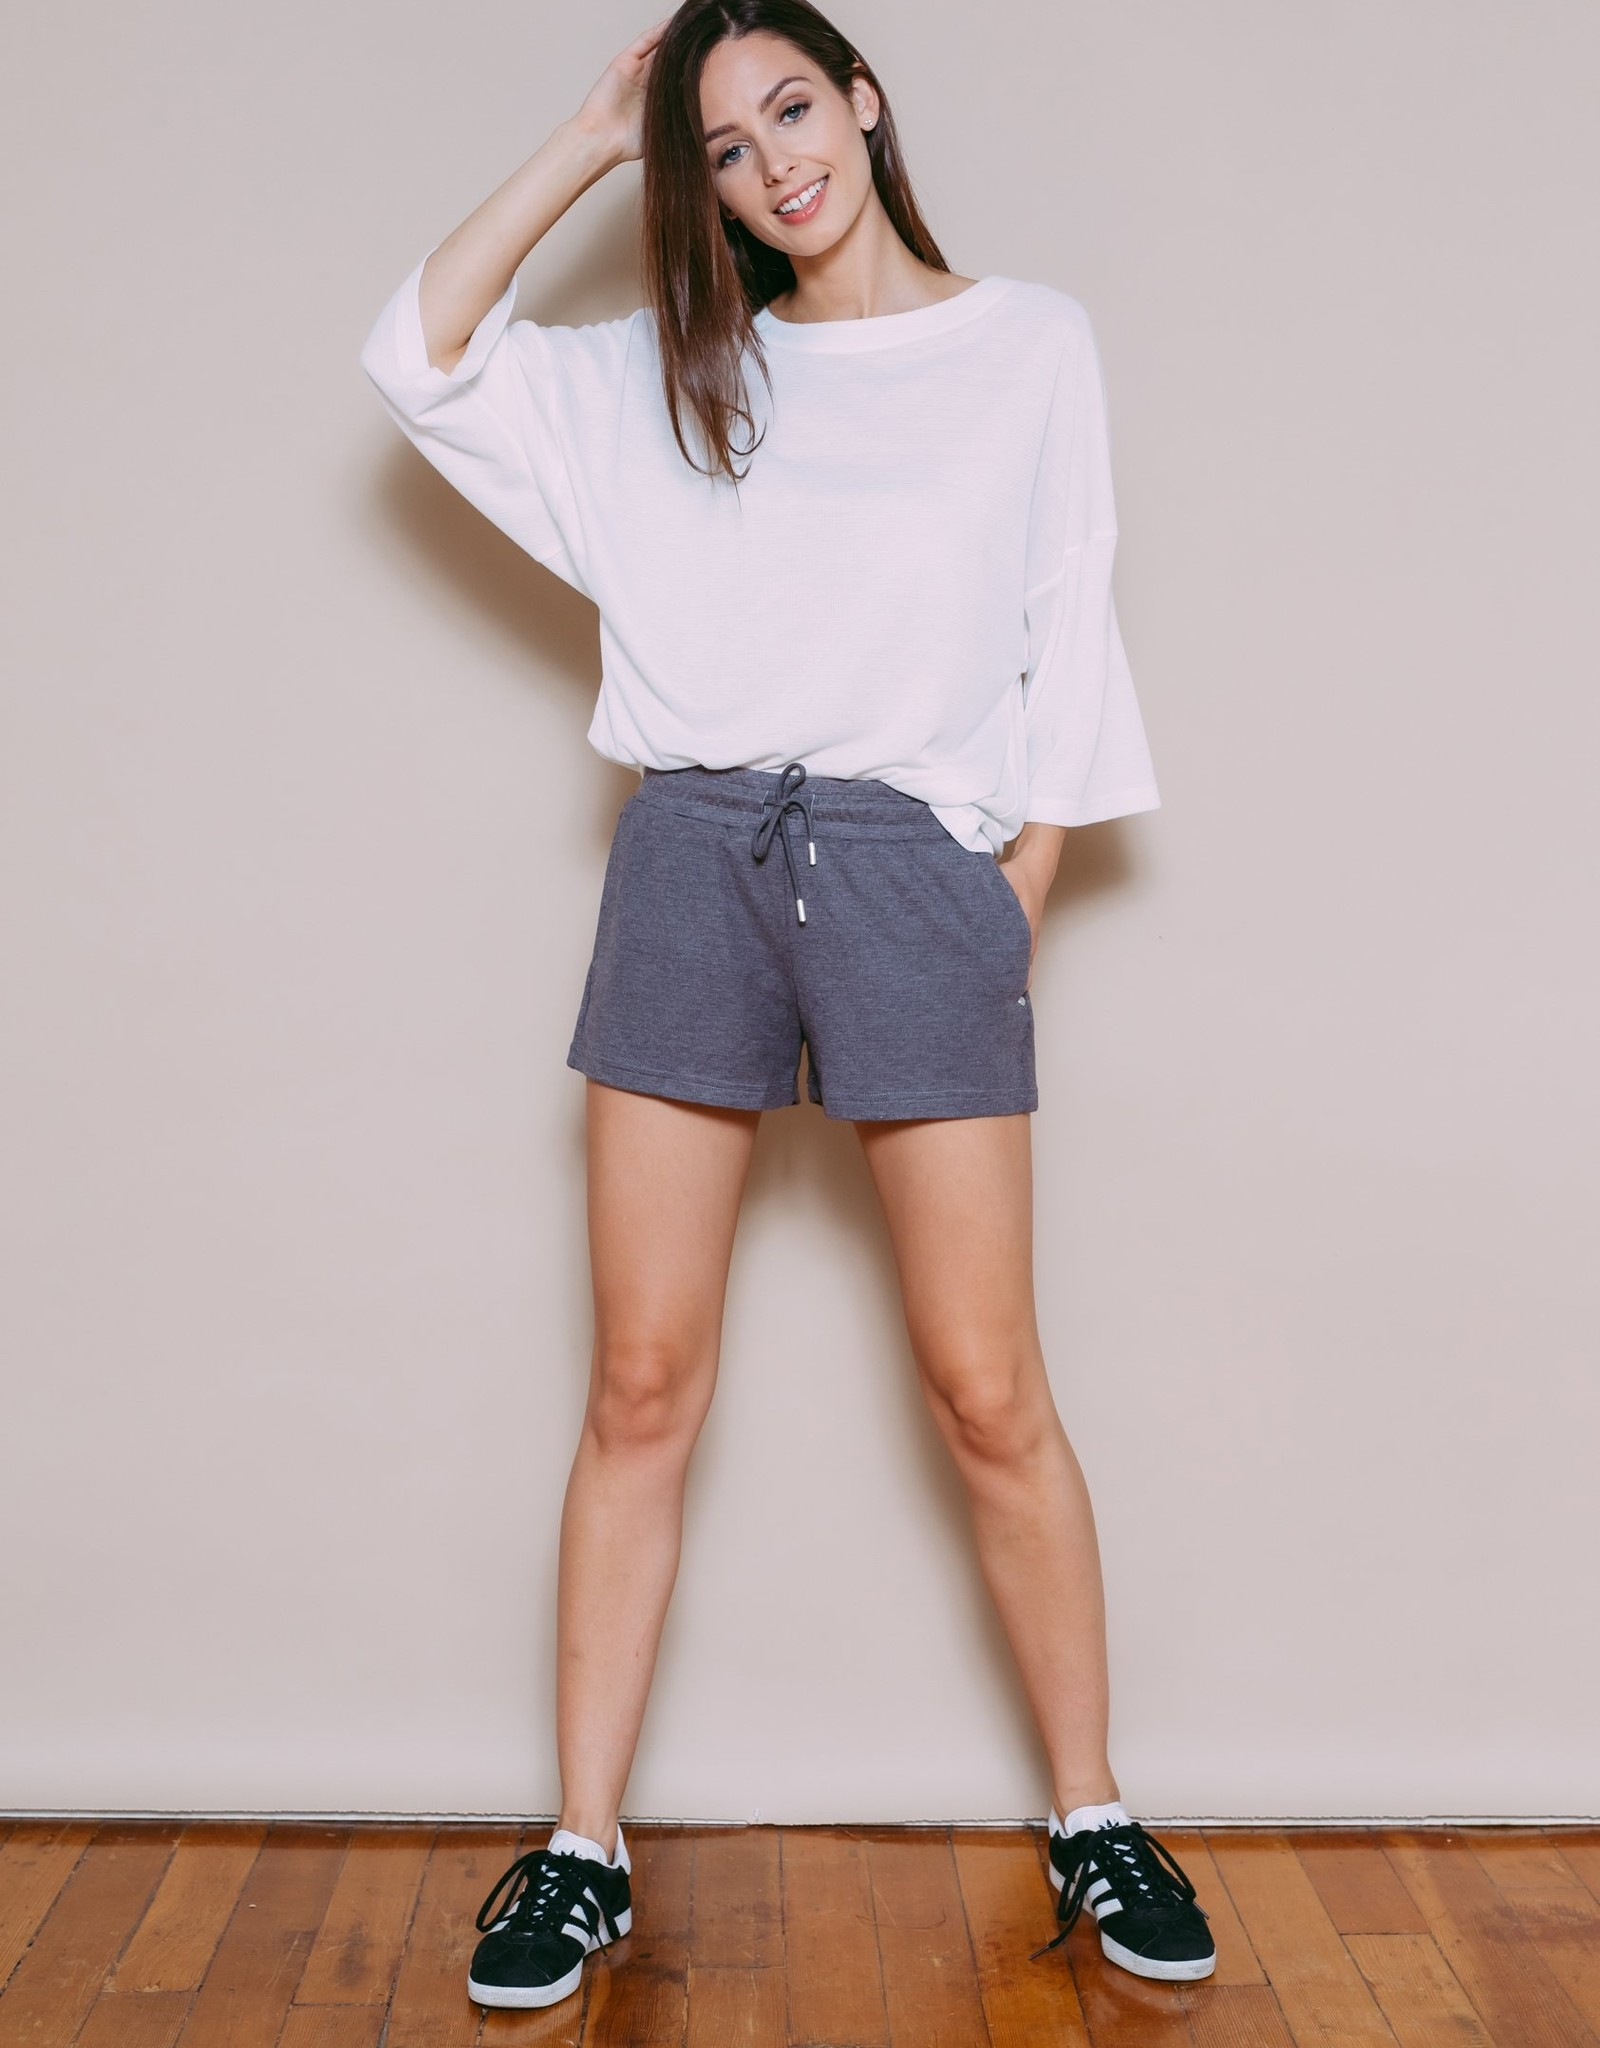 Orb Clothing Dixon Shorts